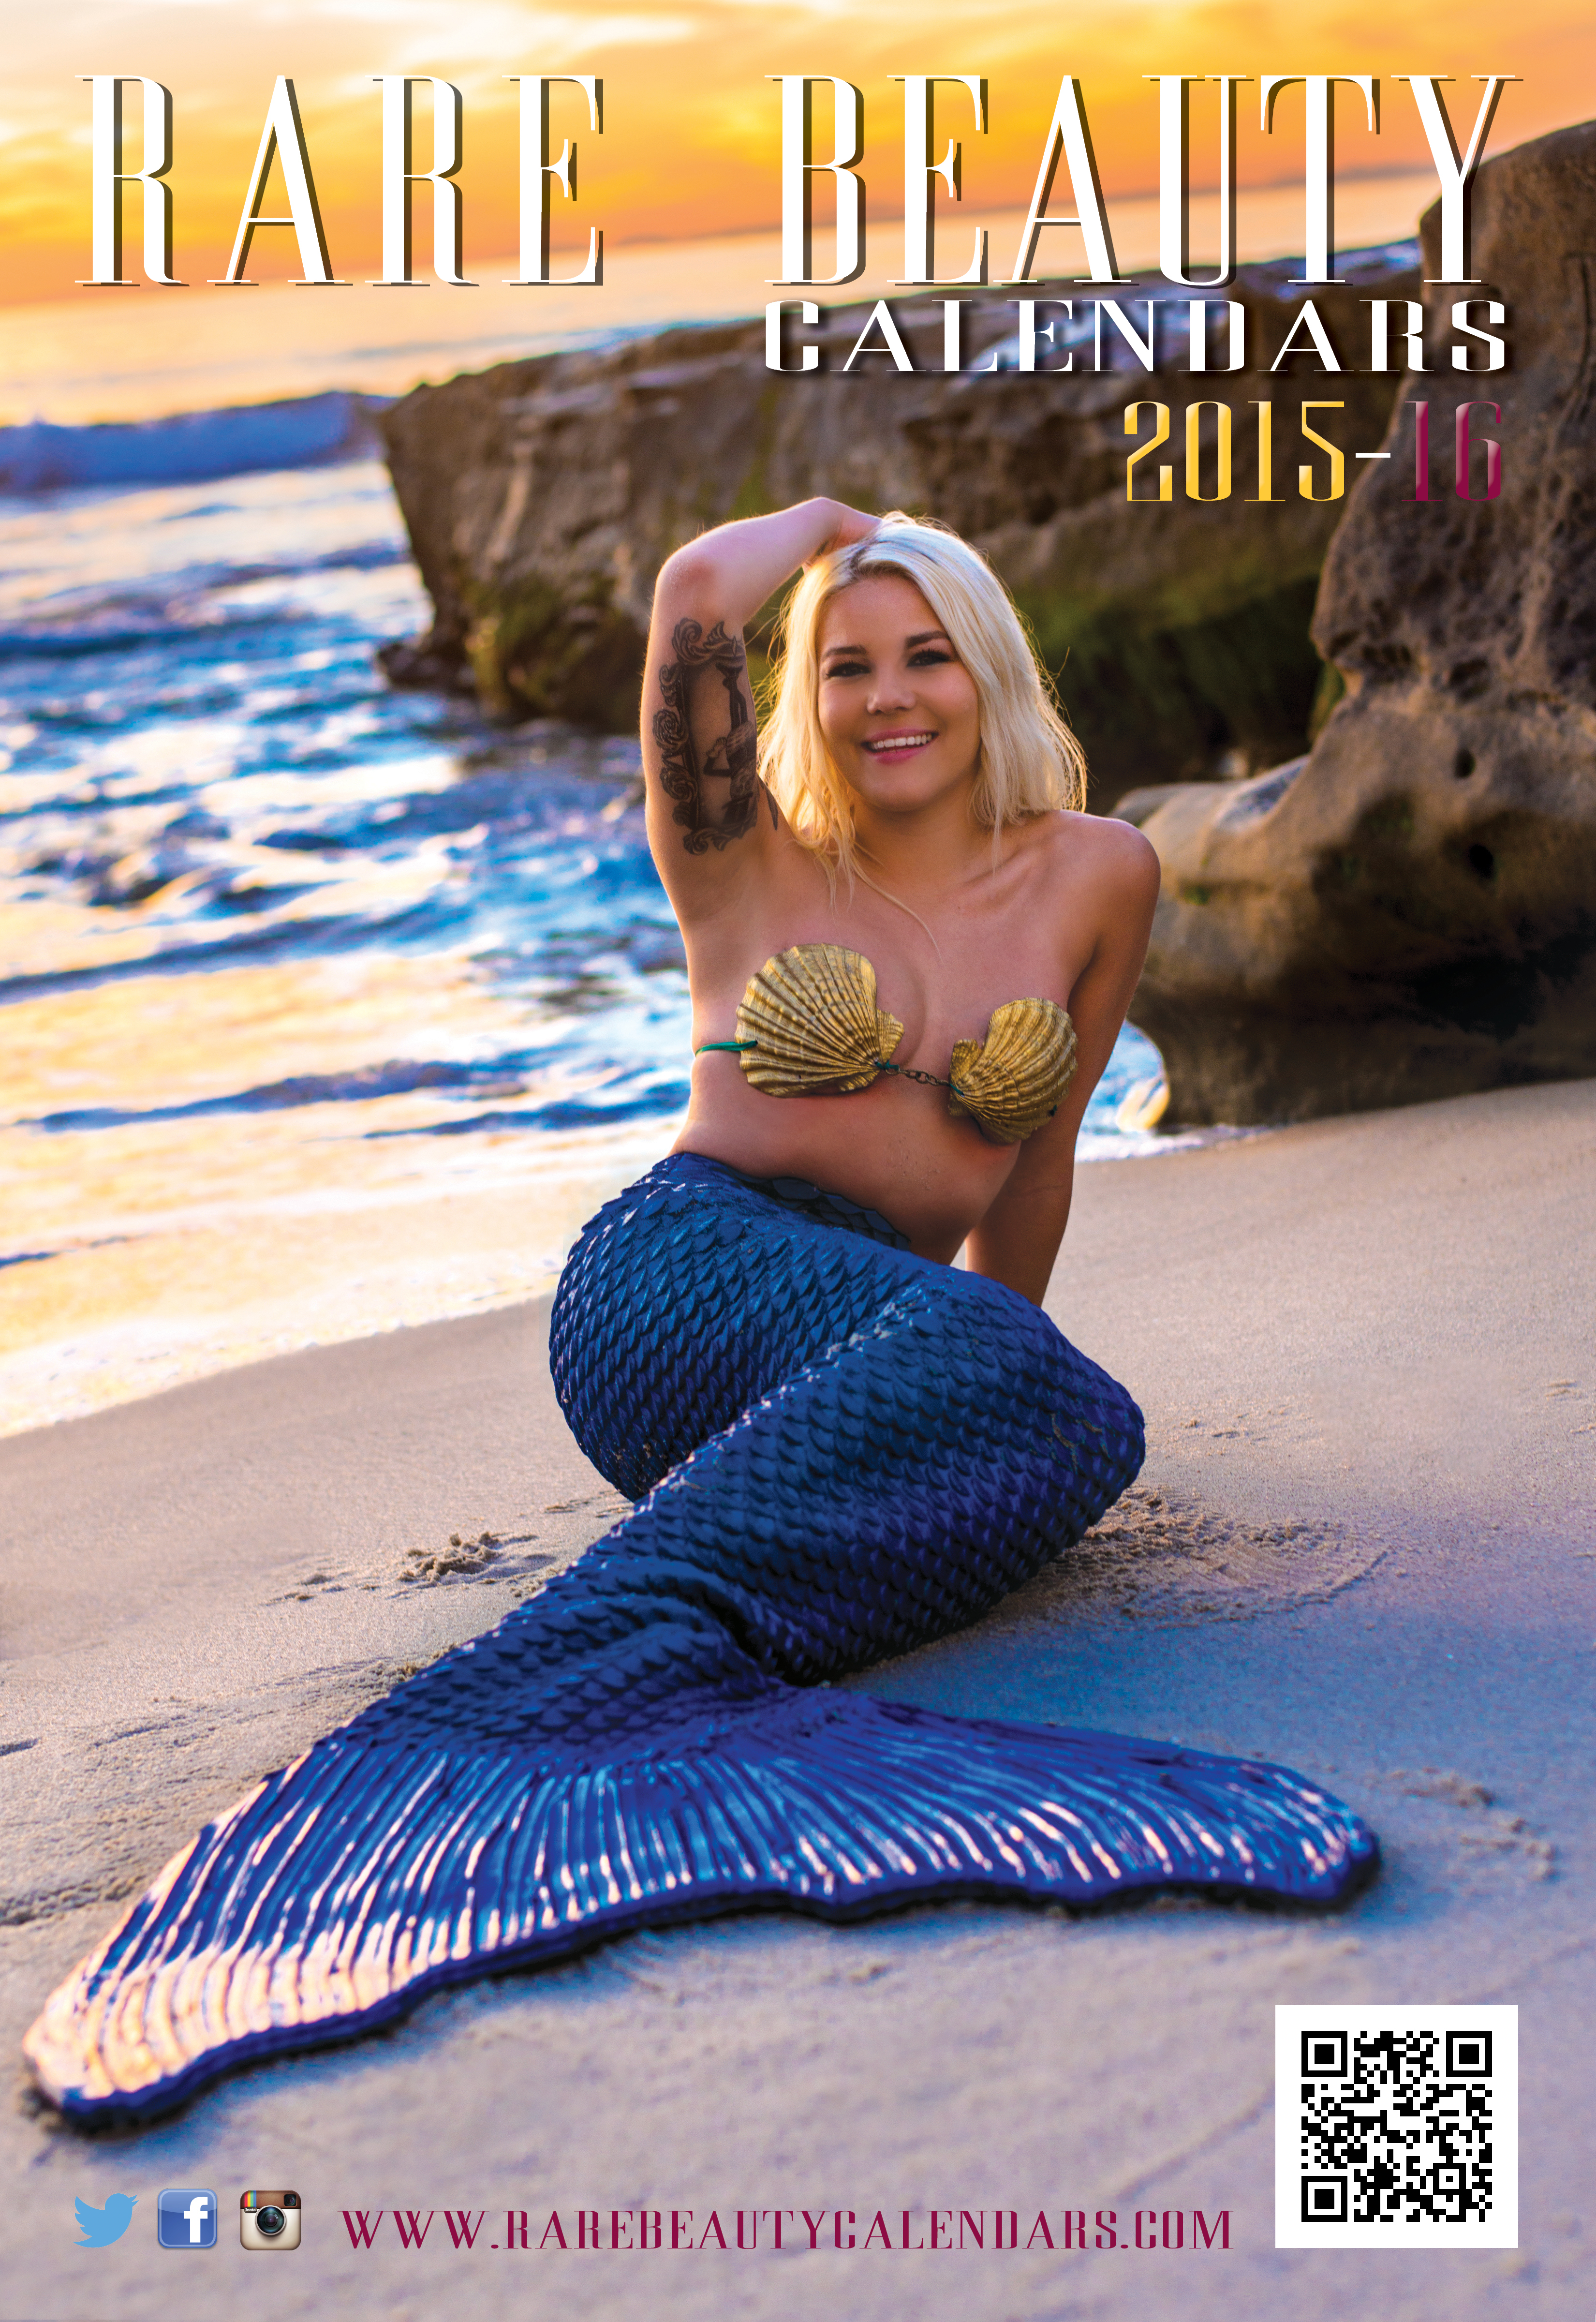 Rare Beauty Calendars 2015-16